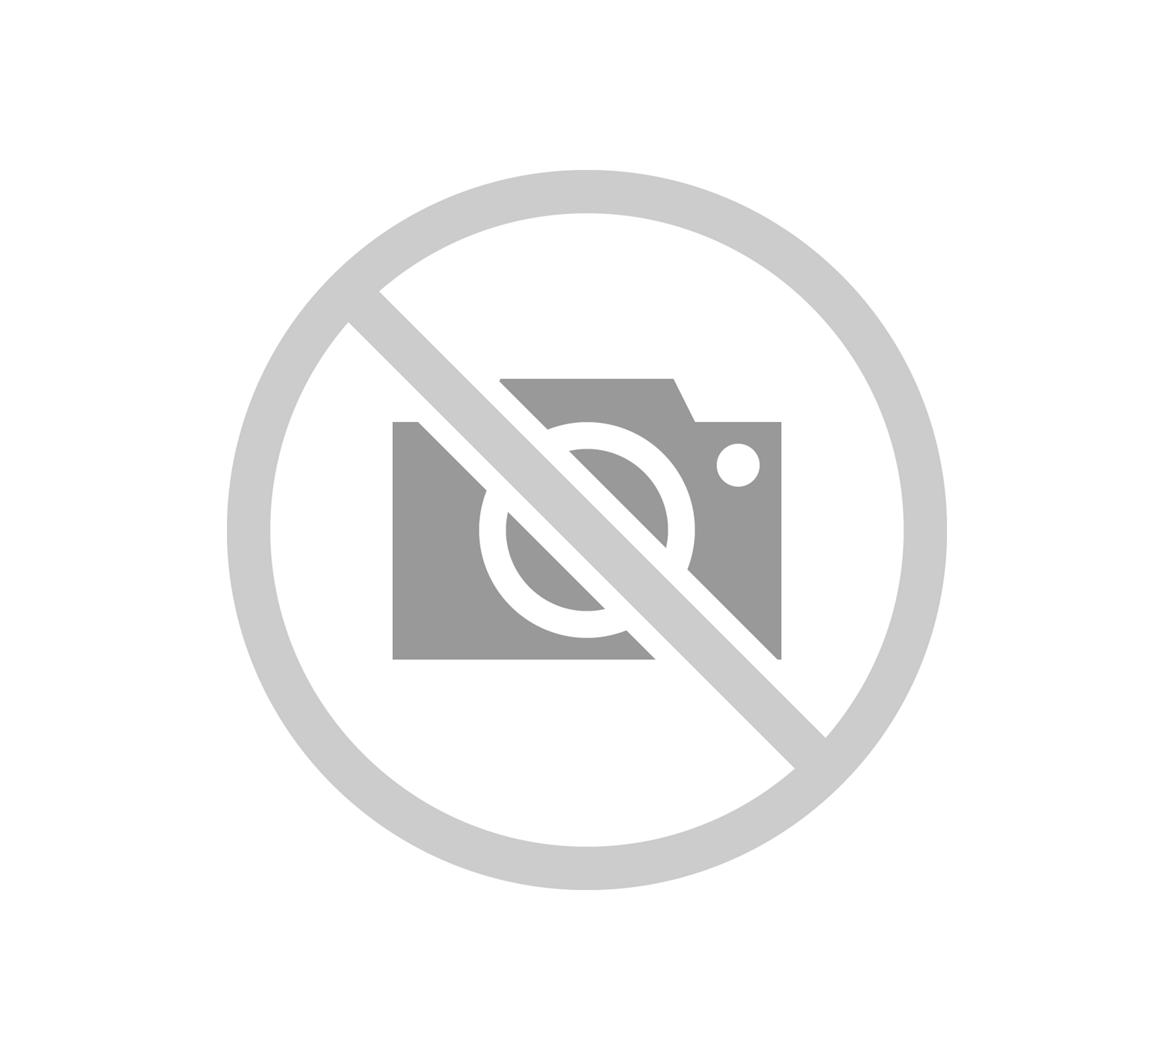 Postel MEADOW 200x140 cm vč. roštu a matrace  dub sonoma